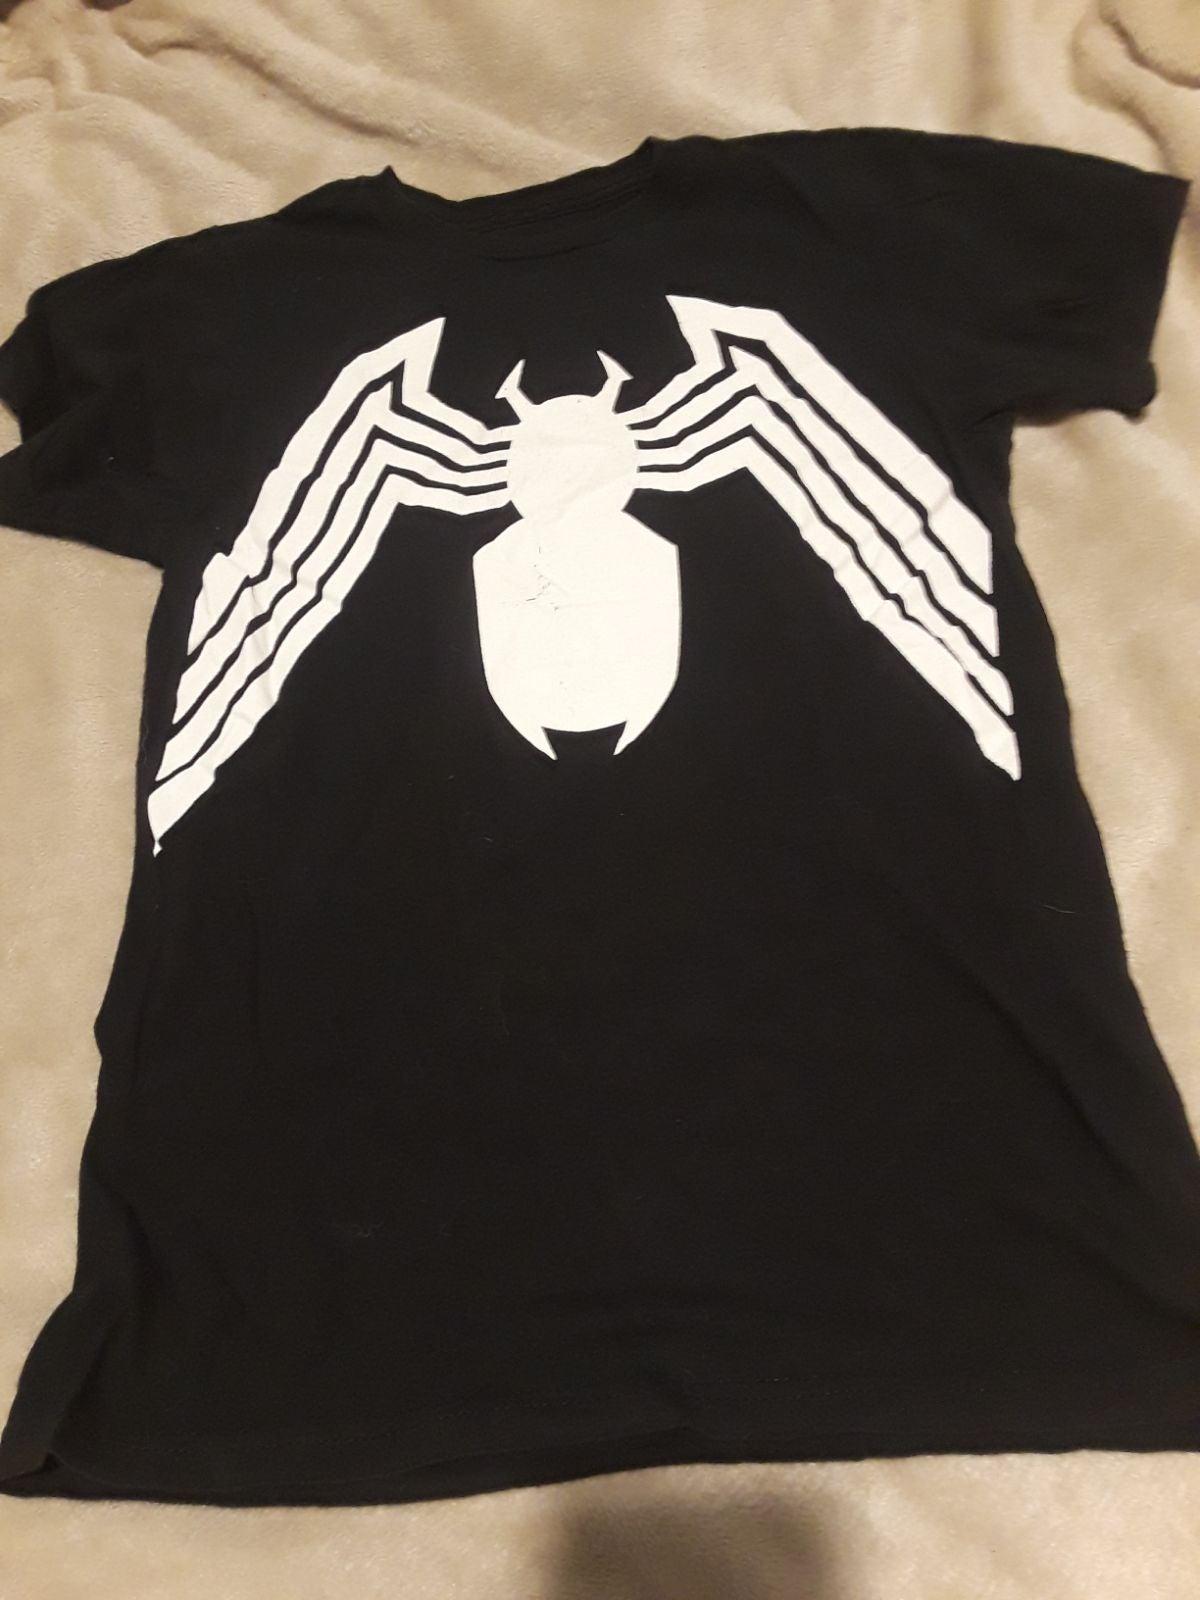 Hot Topic Shirts Bundle